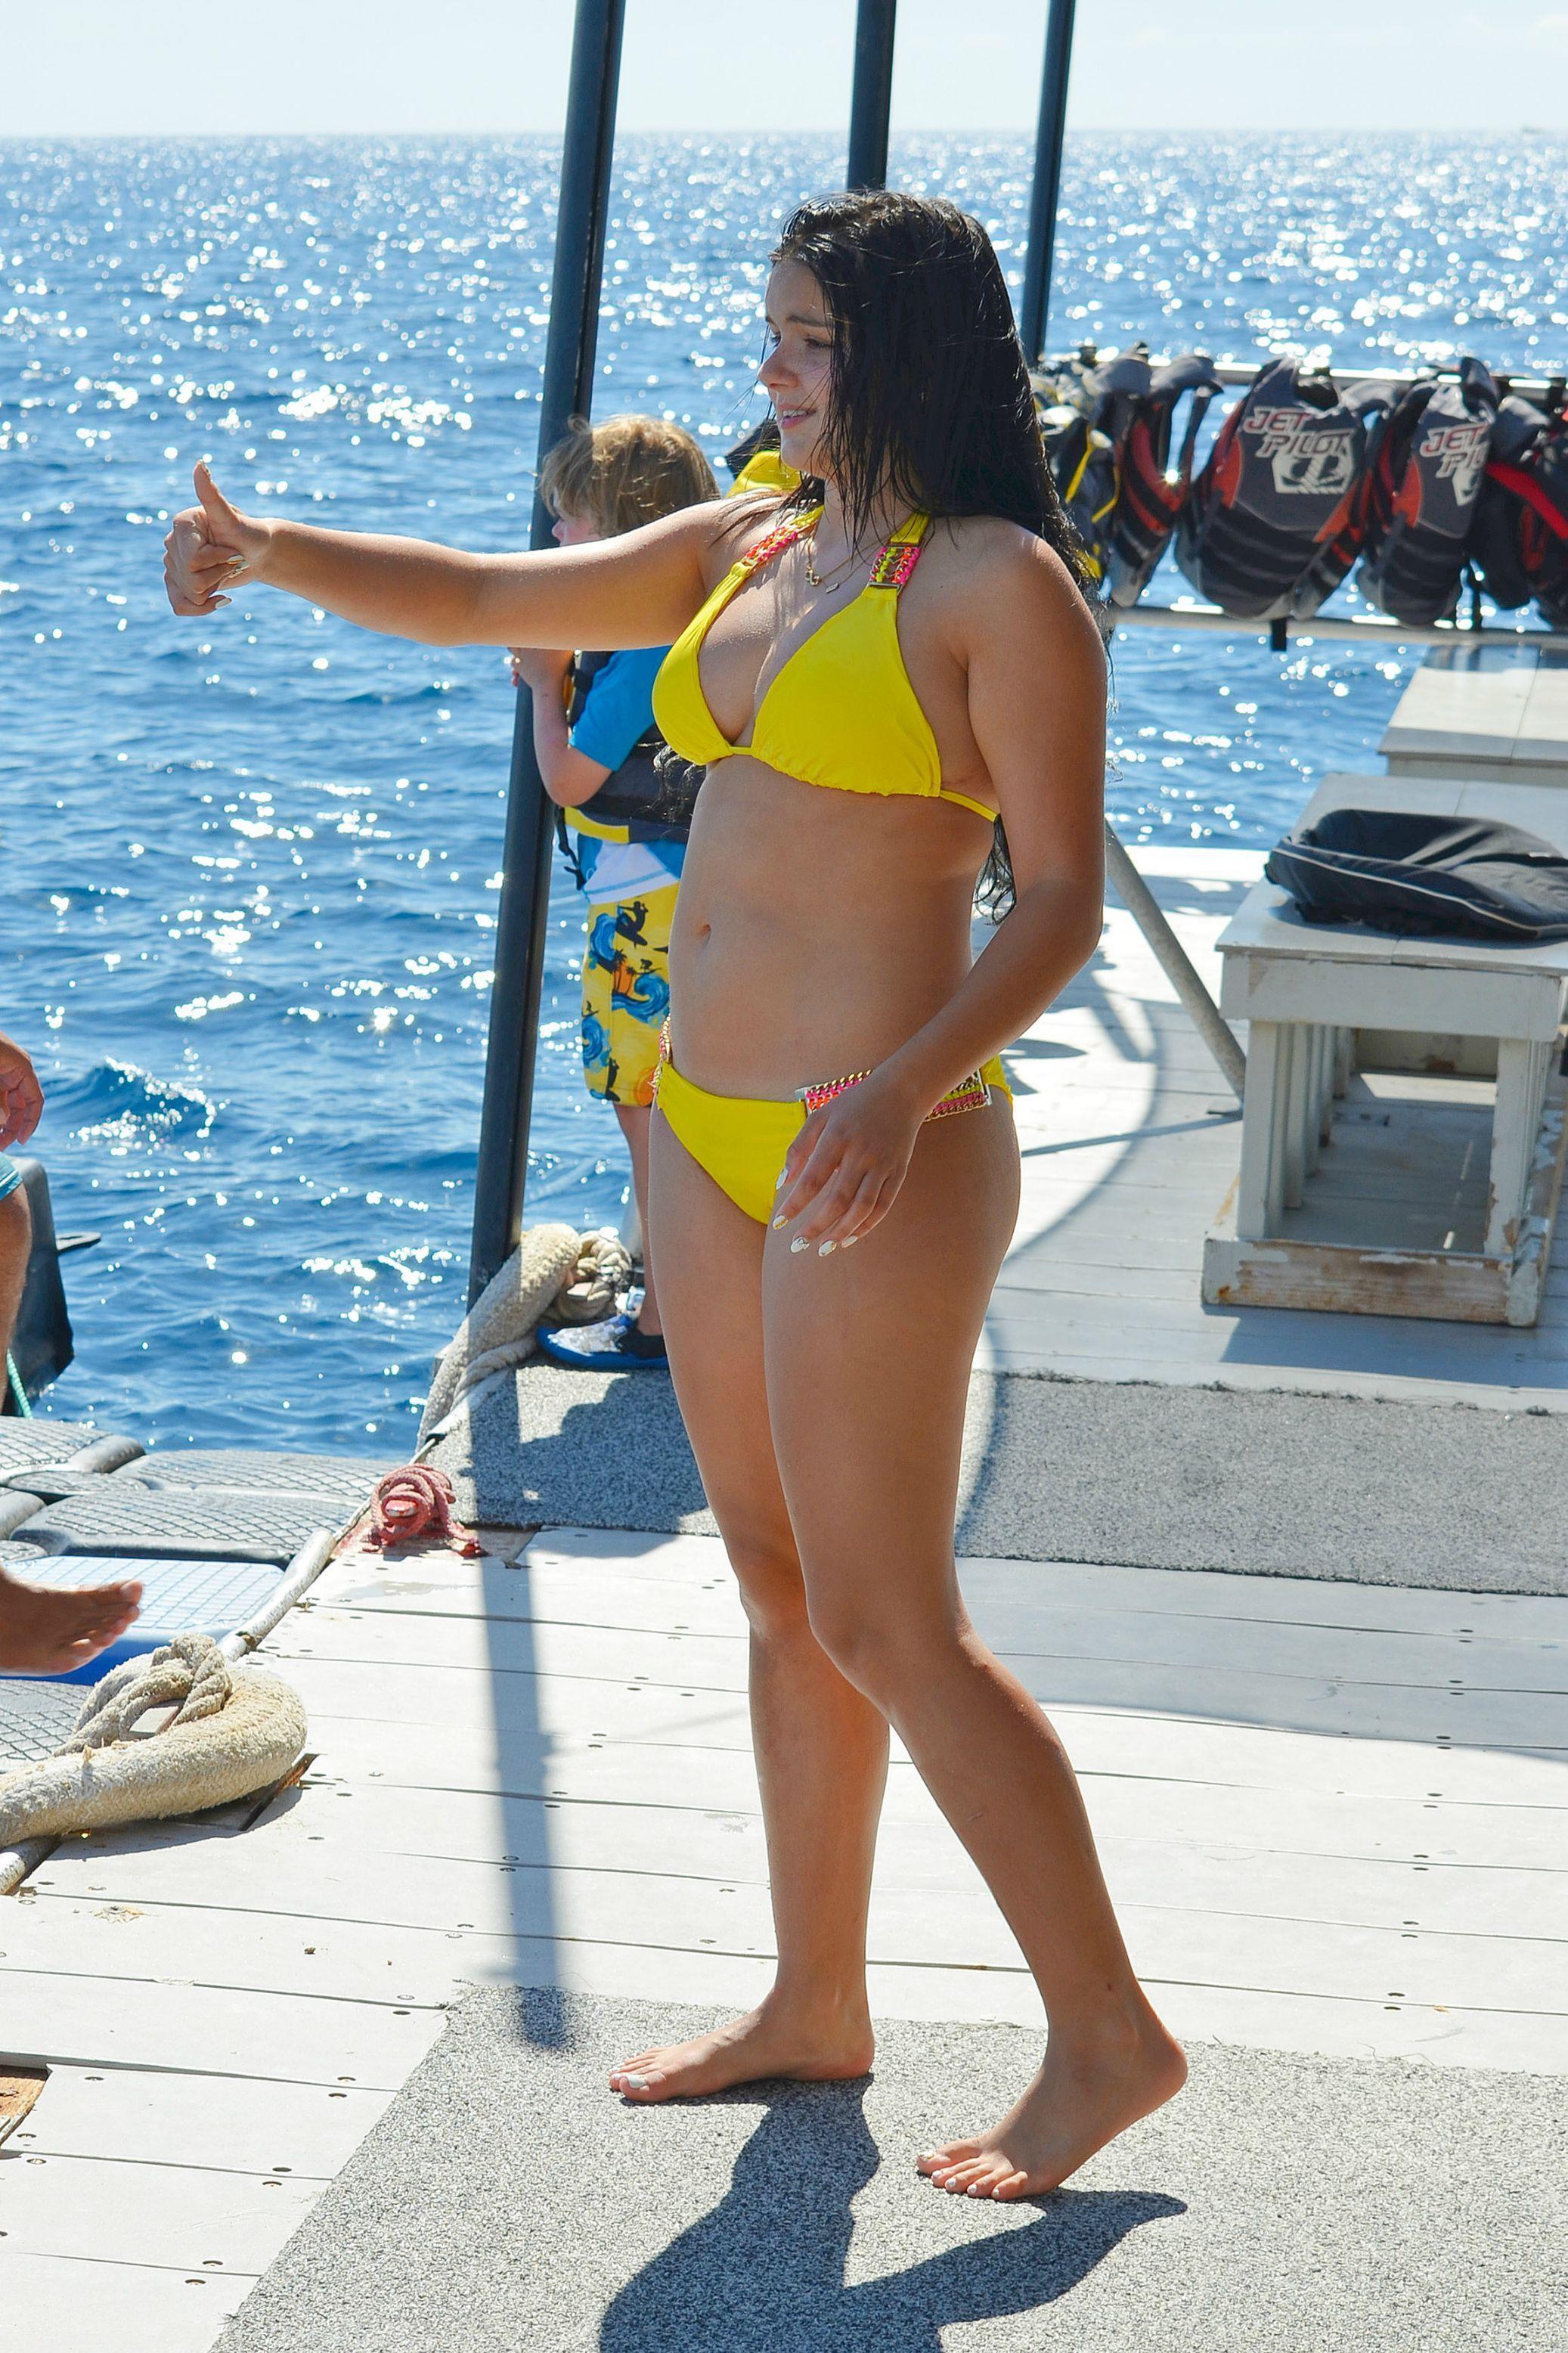 Victoria justice in new york city,Lexi Boling Tit  Erotic pic Khloe Kardashian Sexy photoset. 2018-2019 celebrityes photos leaks!,Rachel McAdams, Rachel Weisz Disobedience - 2019